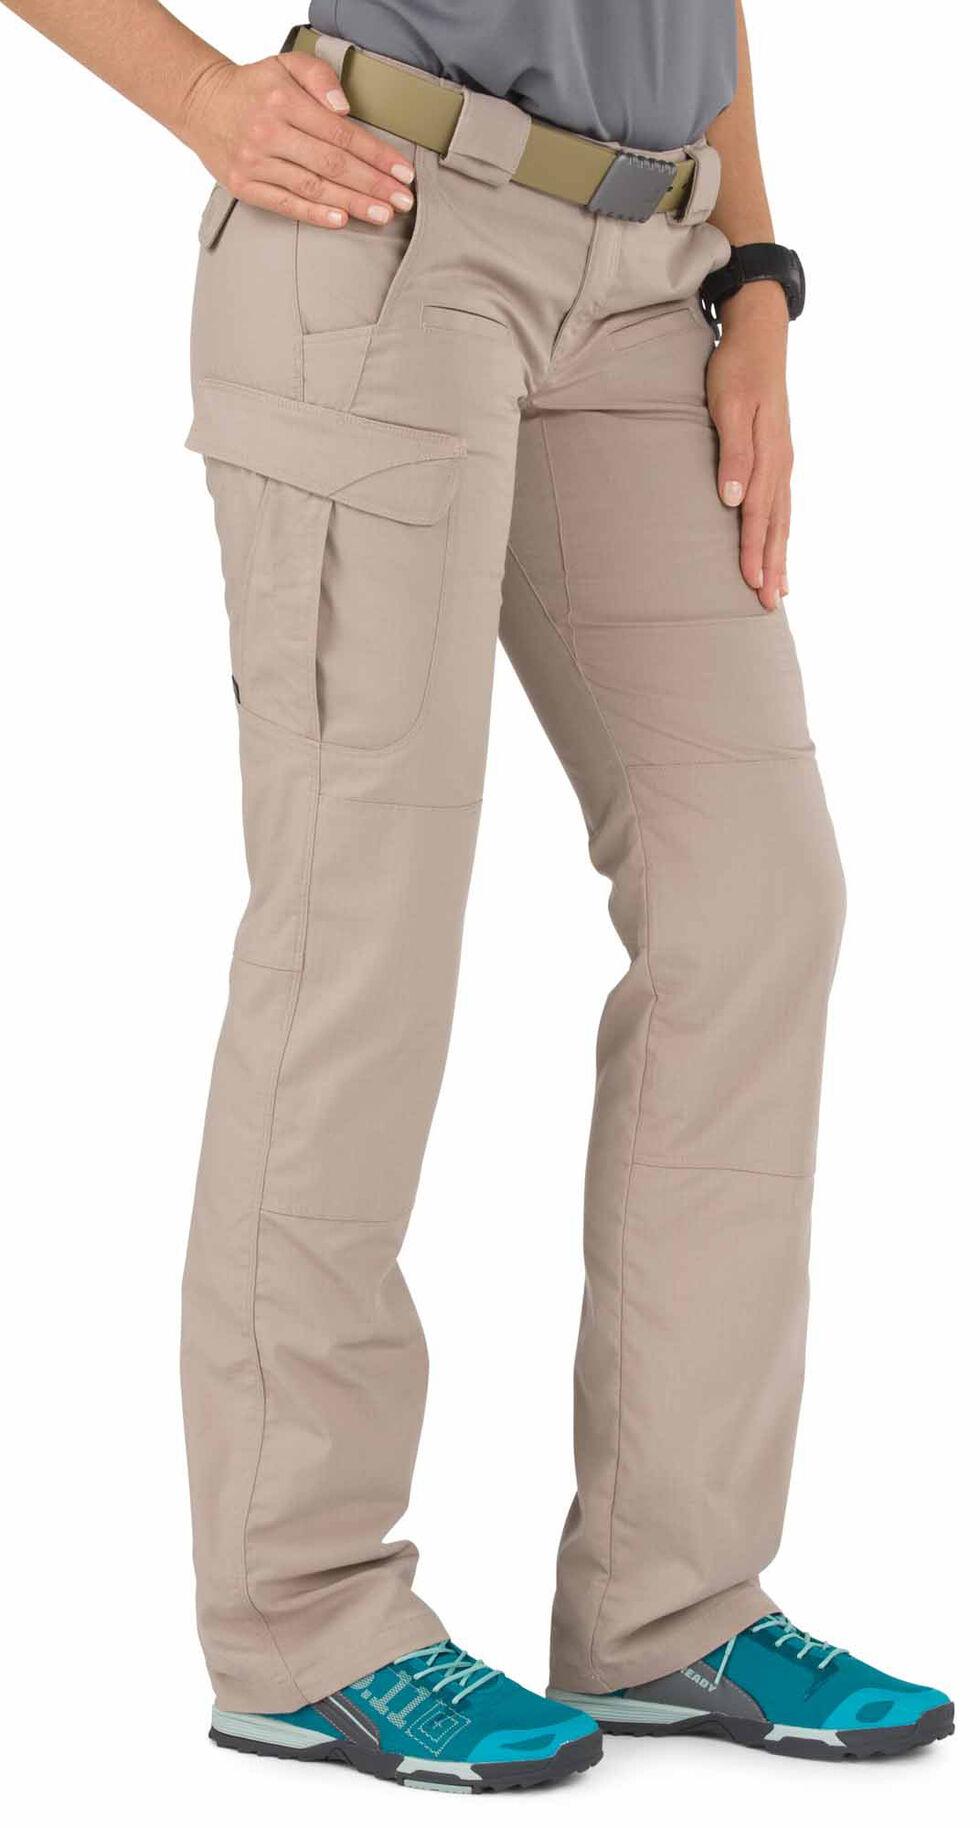 5.11 Tactical Women's Stryke Pants, Khaki, hi-res